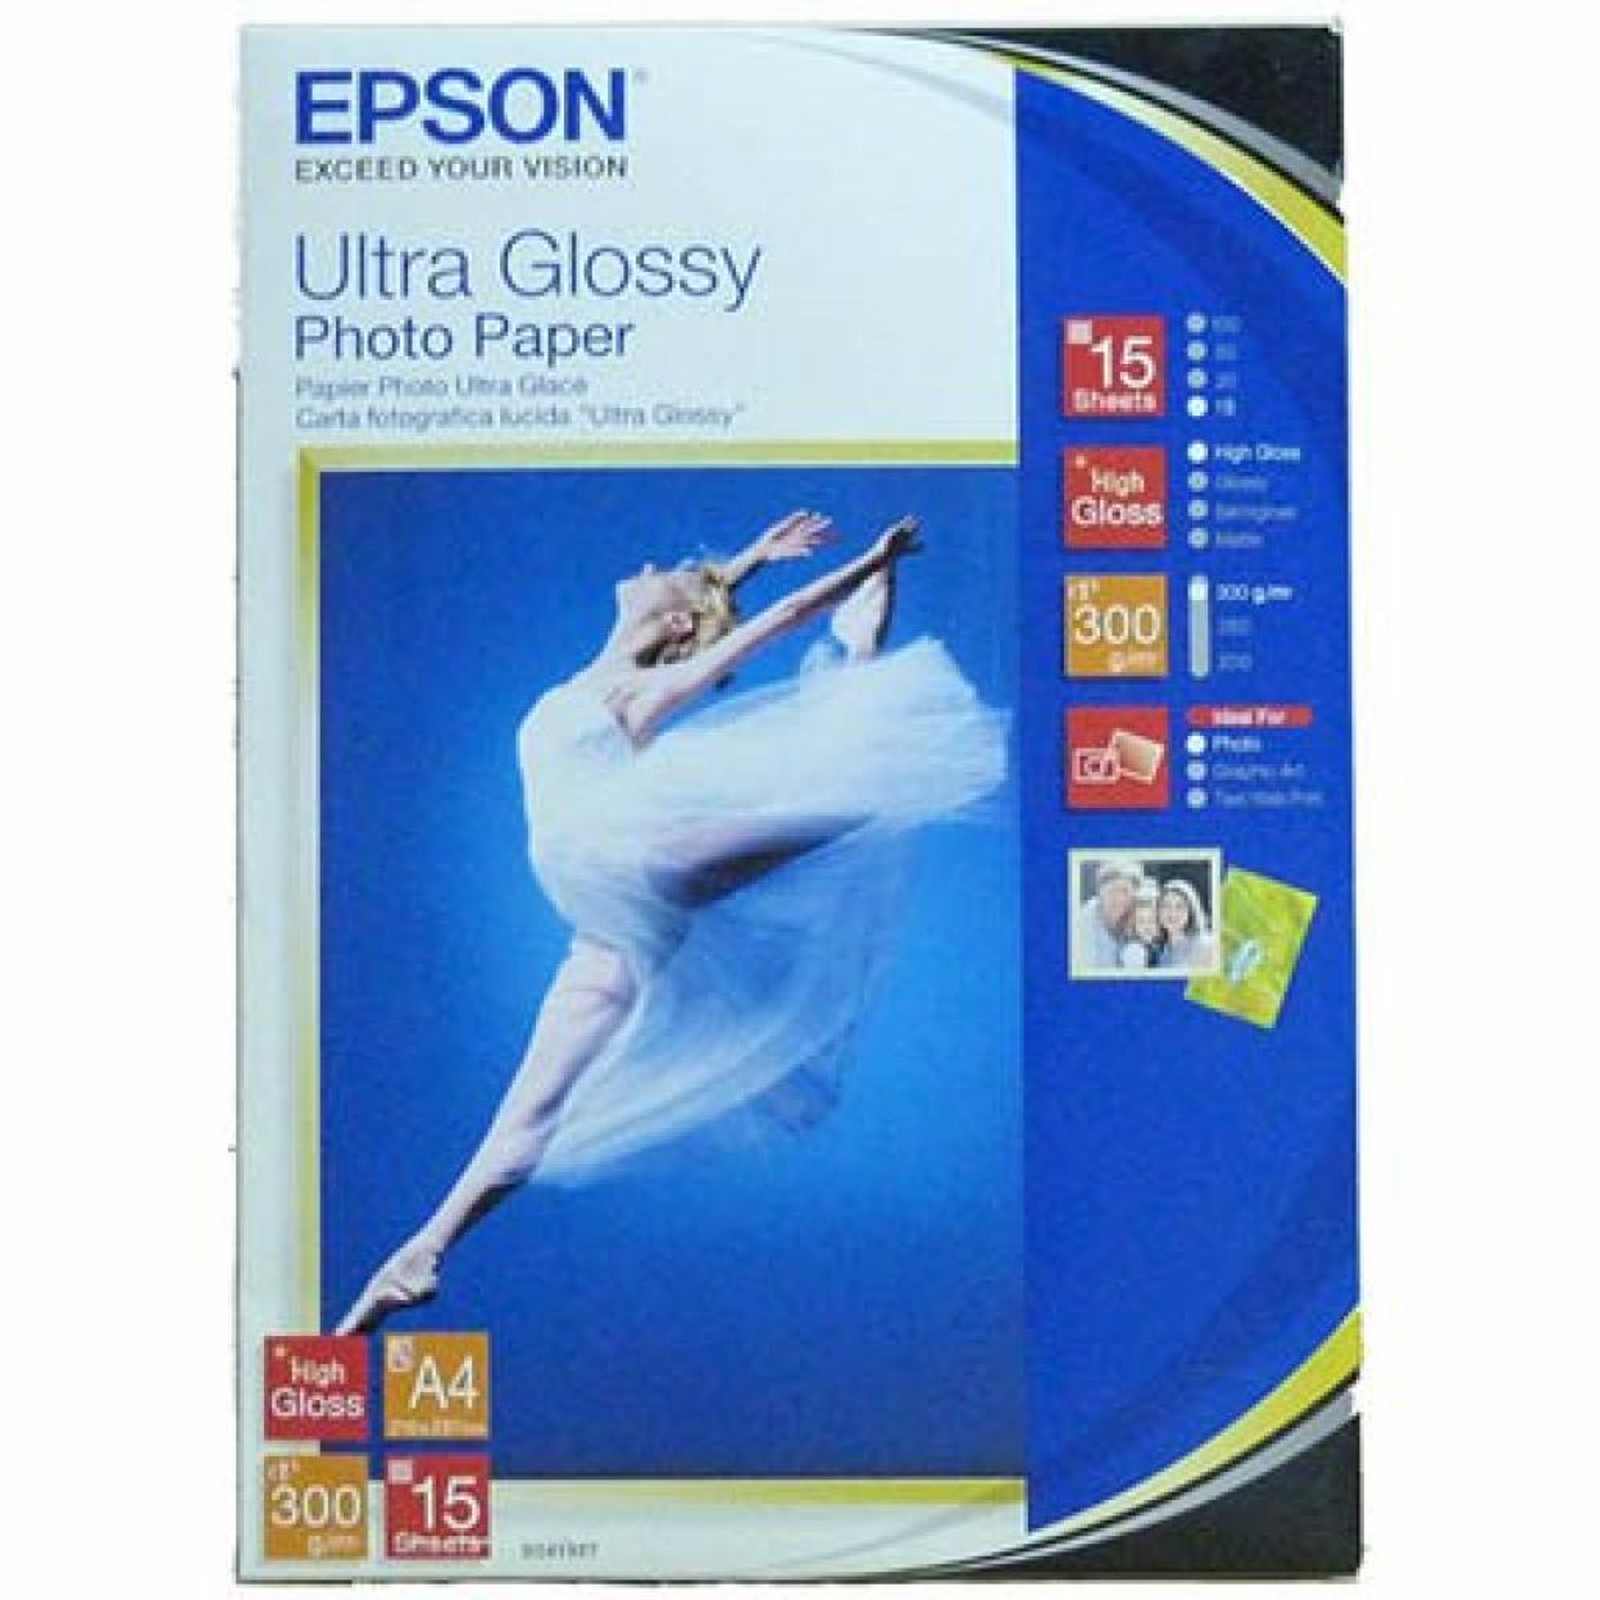 Бумага EPSON A4 Ultra Glossy Photo Paper (C13S041927)